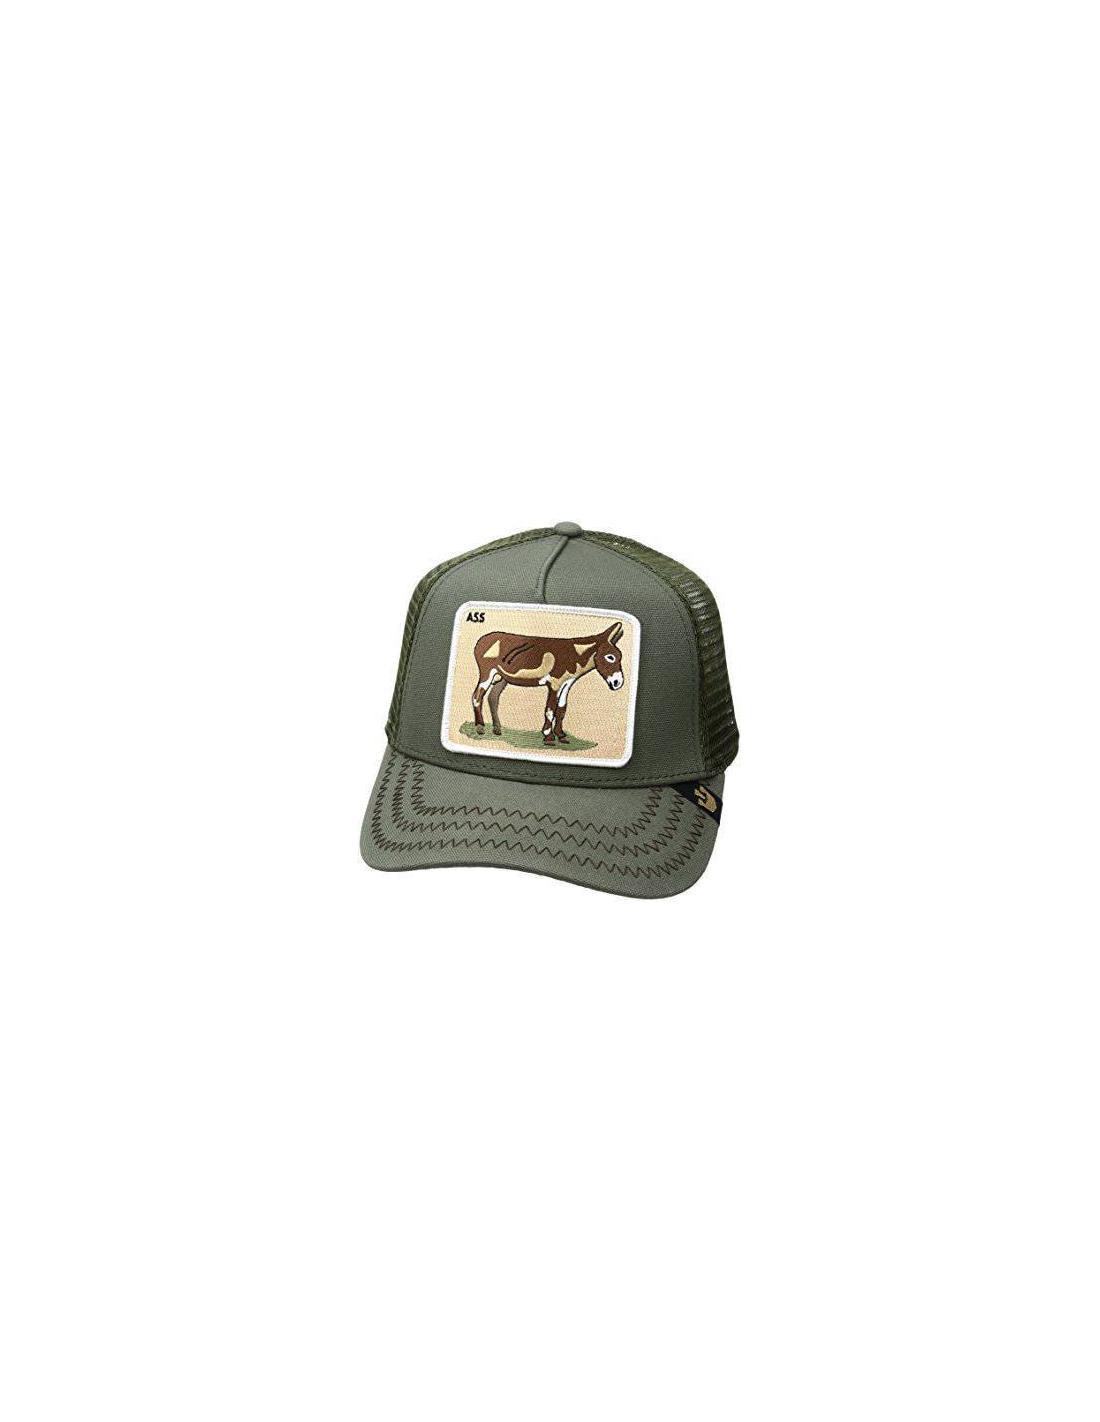 4db9a77ec8054 Previous. Goorin Bros Barn Donkey Ass Olive Animal Farm Trucker Hat. Goorin  Bros Barn Donkey Ass Olive Animal Farm Trucker Hat